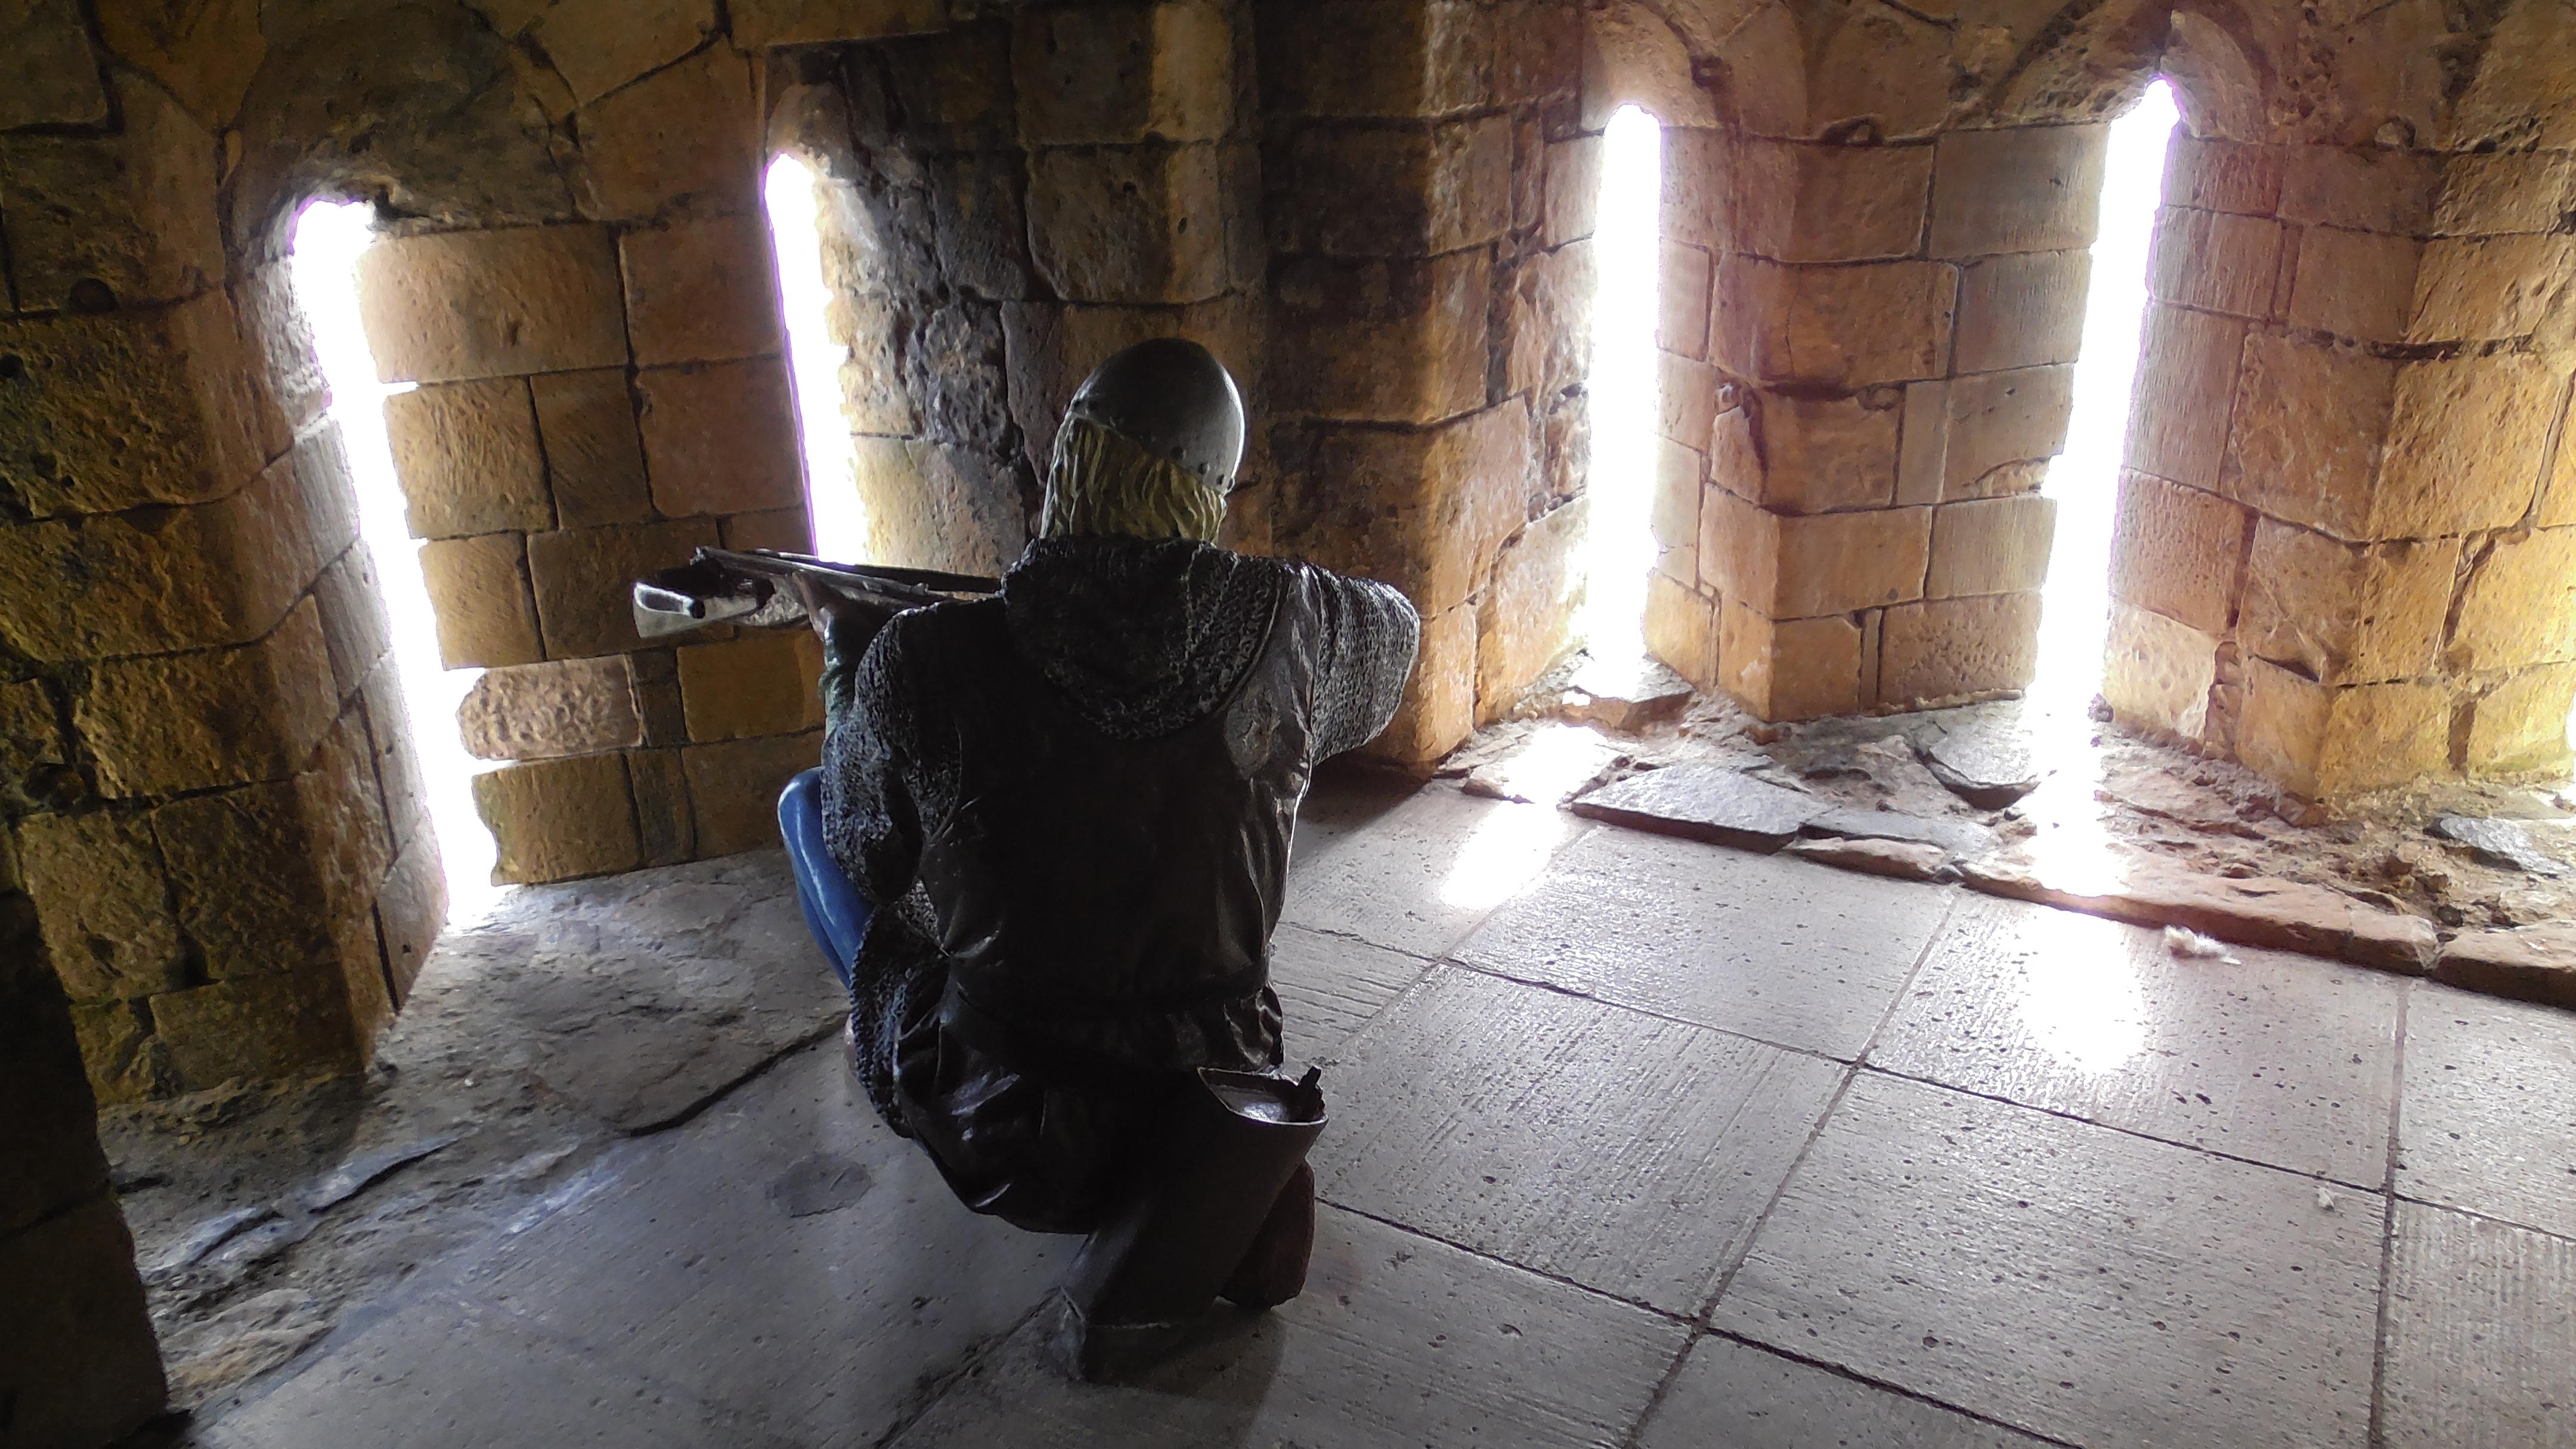 Armbrustschütze Castle Carrickfergus